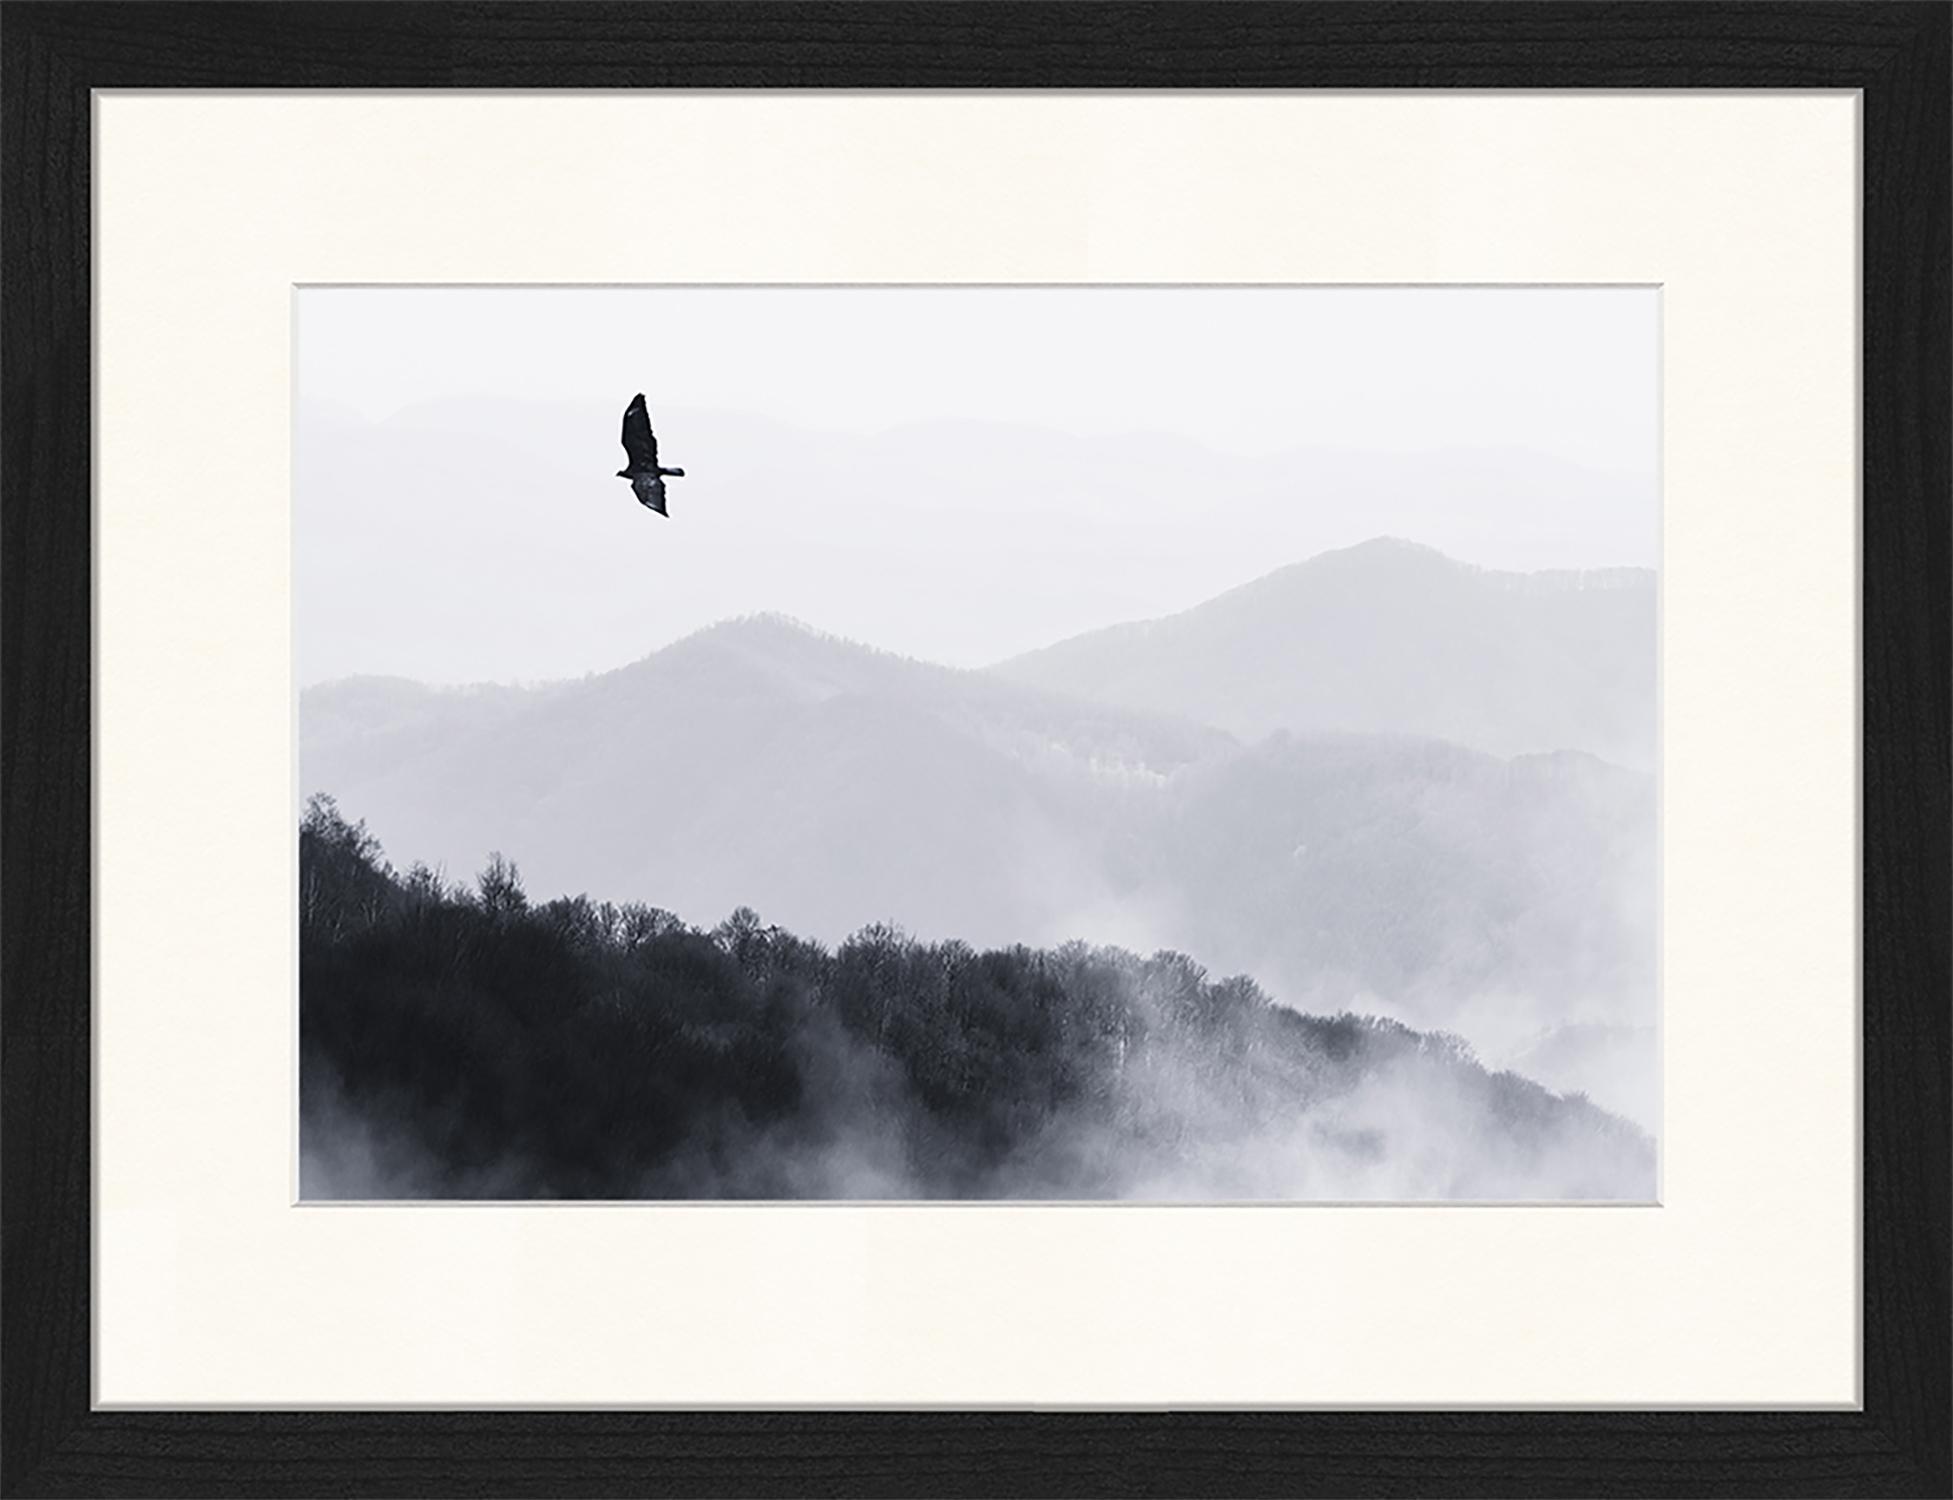 Stampa digitale incorniciata Bird Flying Over Misty Hills, Immagine: stampa digitale su carta,, Cornice: legno, verniciato, Nero, bianco, Larg. 43 x Alt. 33 cm